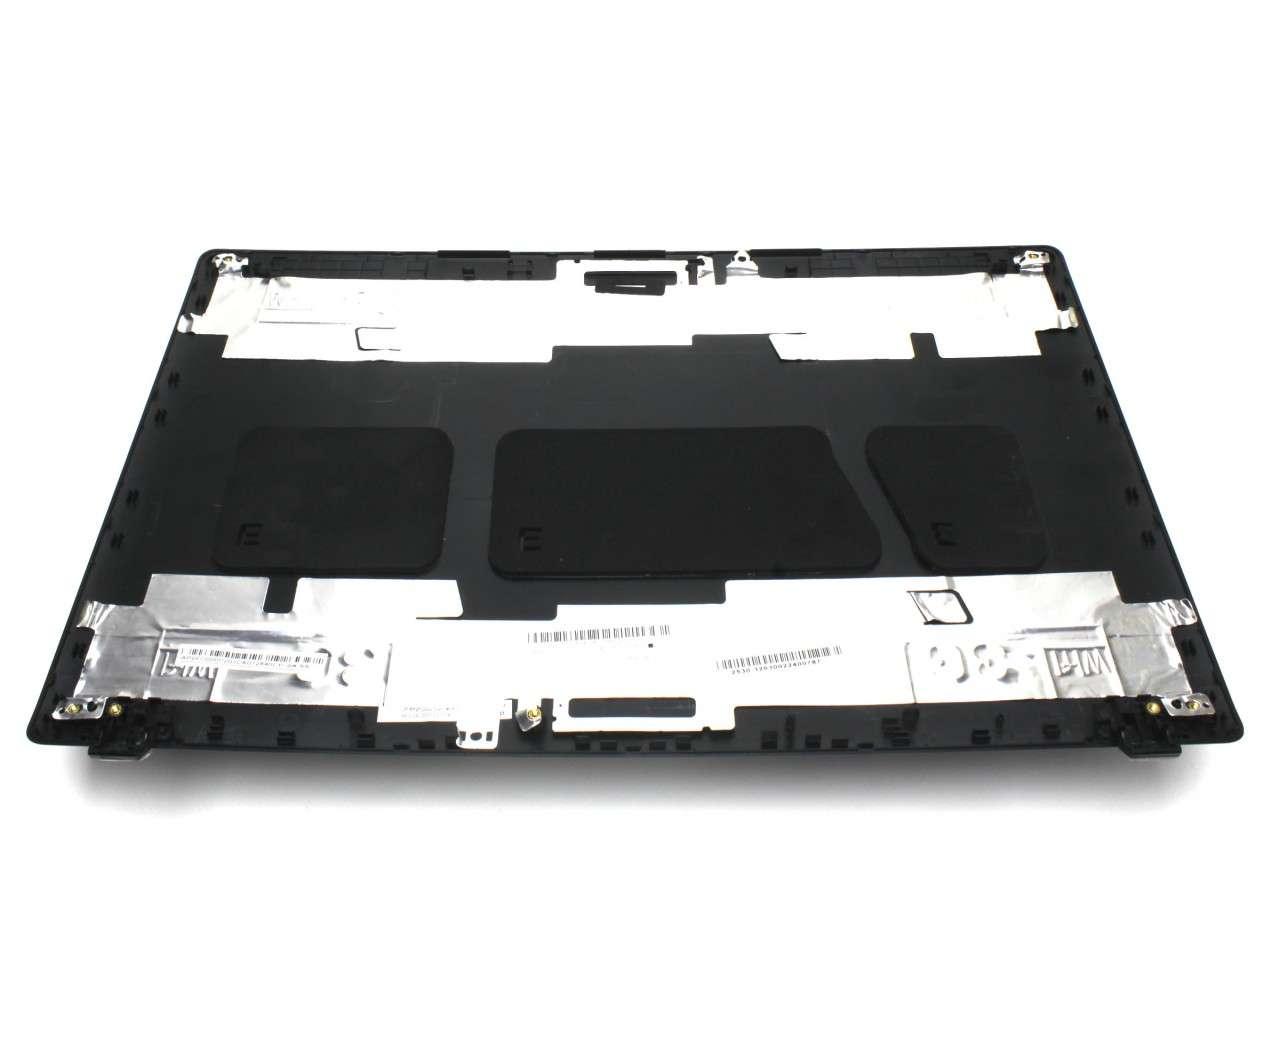 Capac Display BackCover Acer 60 RJW02 003 Carcasa Display Maro imagine